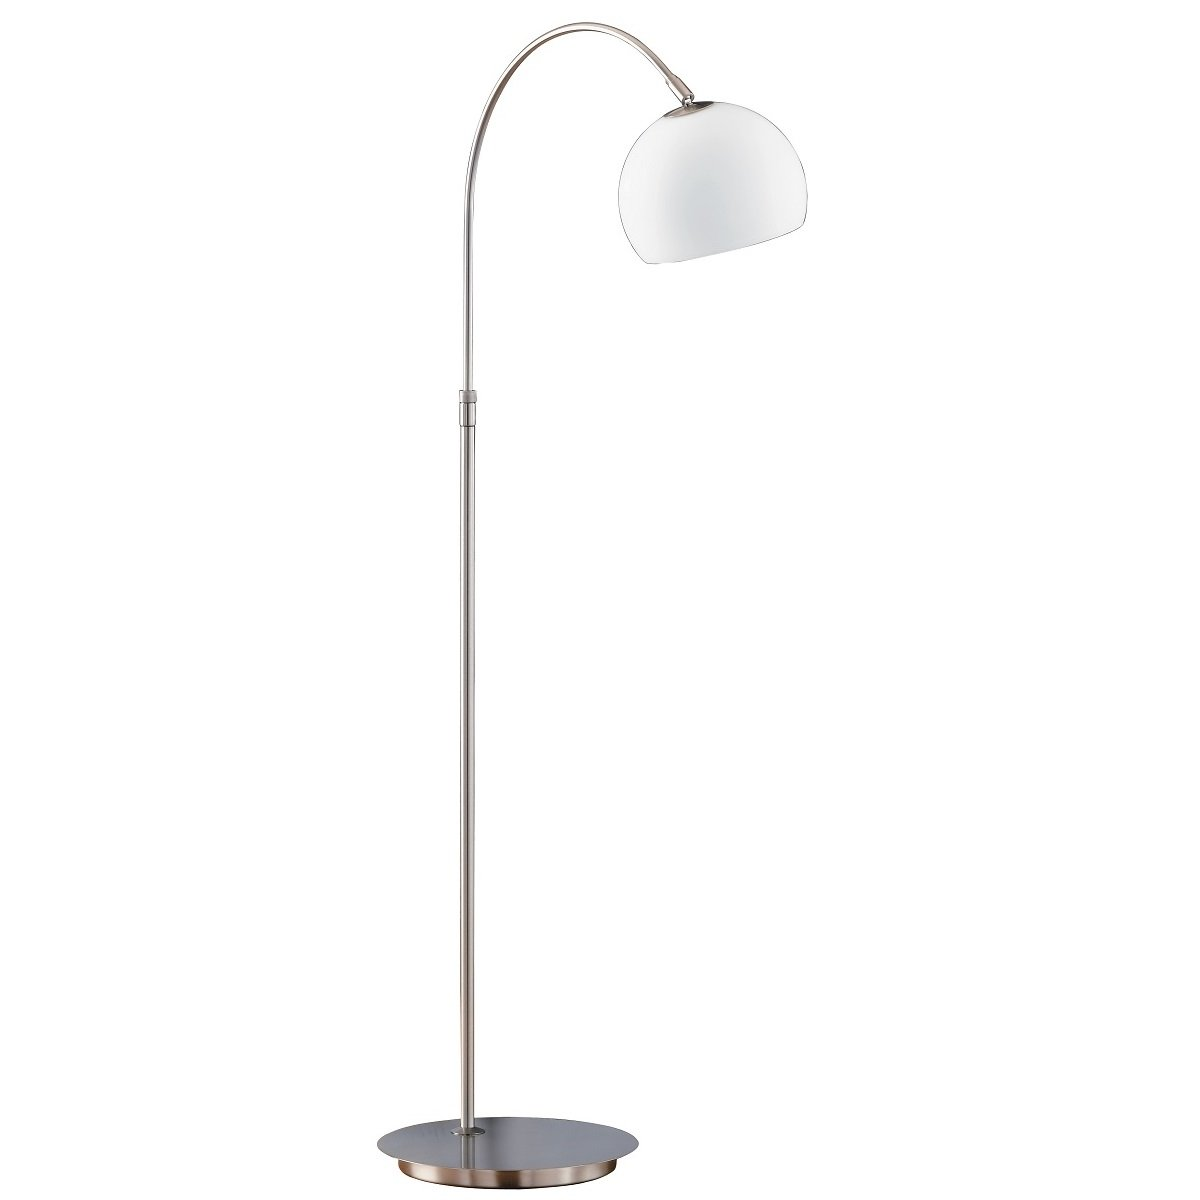 honsel leuchten no 49191 h stehleuchte bow mattnickel eur 105 25 leuchten lampen led. Black Bedroom Furniture Sets. Home Design Ideas